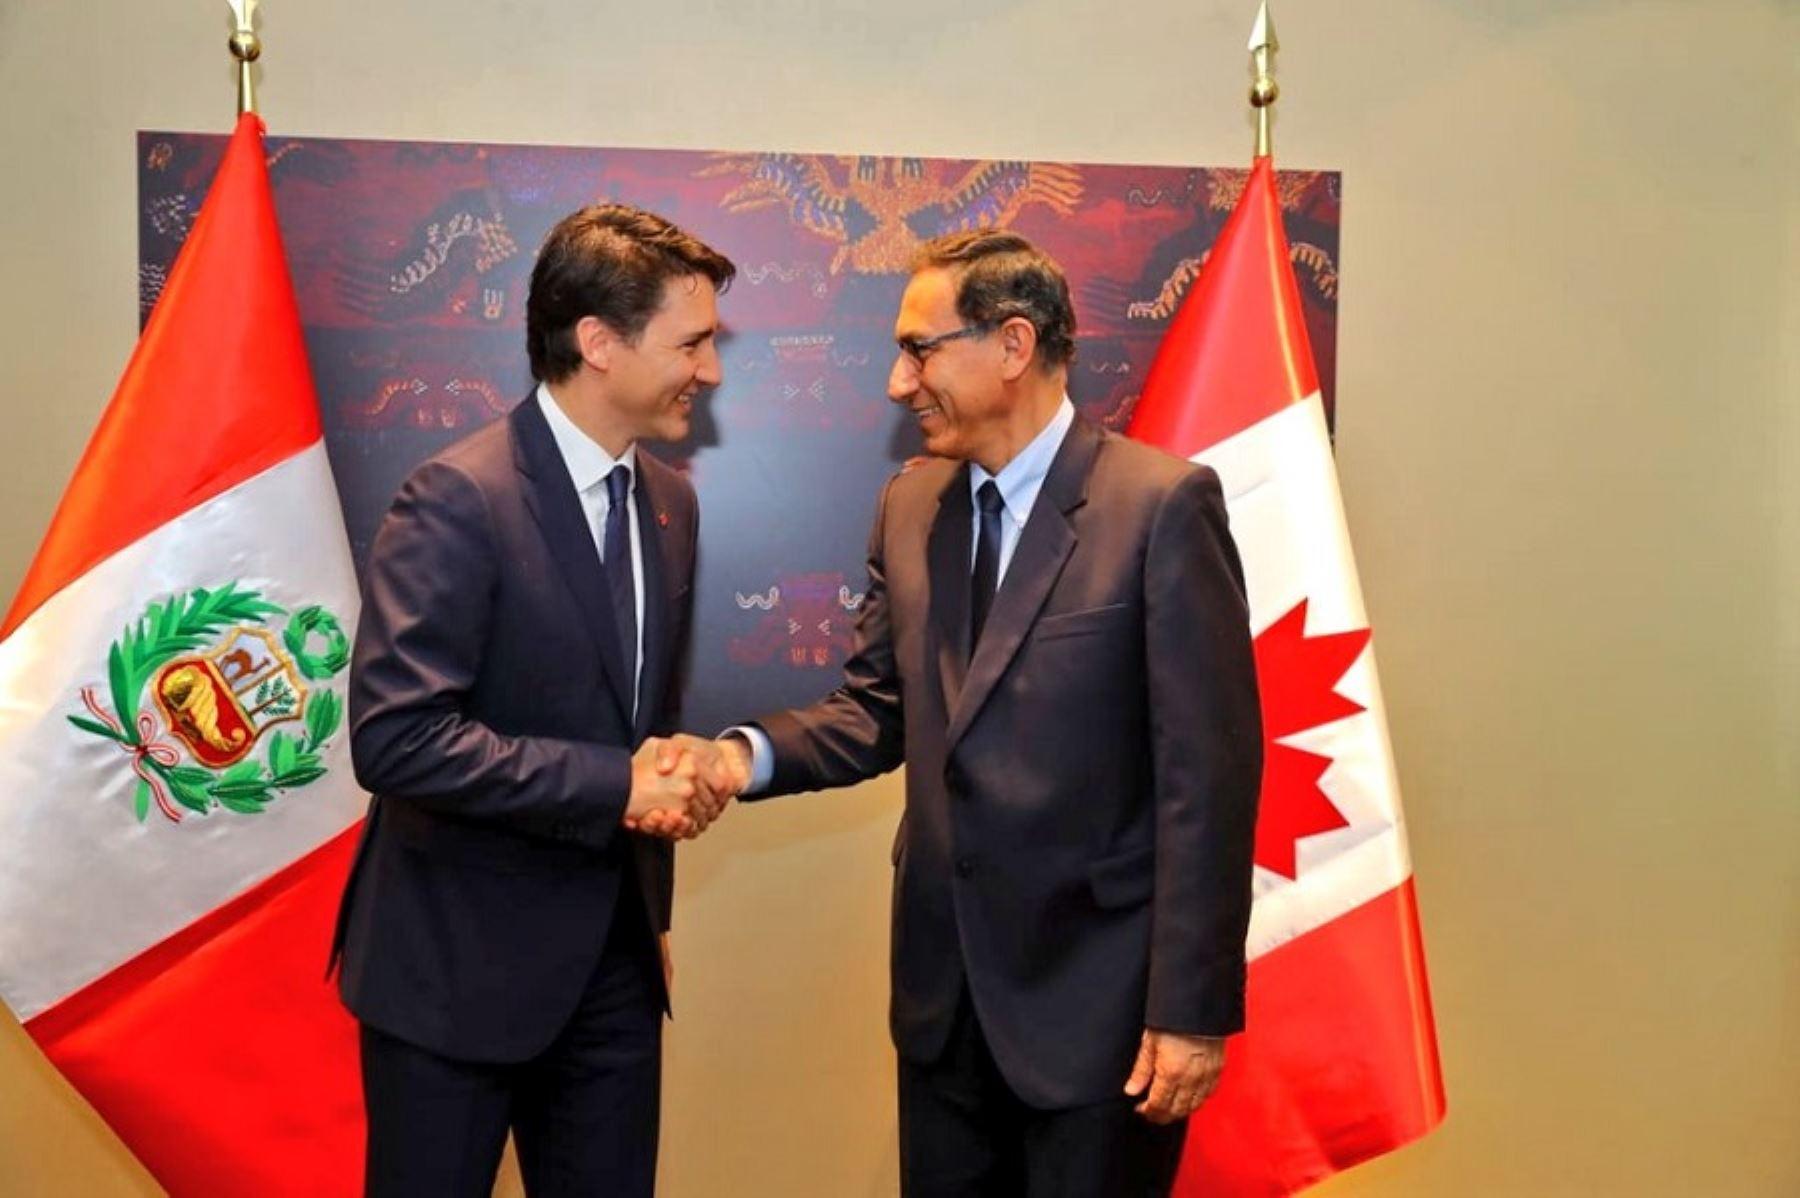 Presidente Vizcarra se reunió con Trudeau para fortalecer relación con Canadá